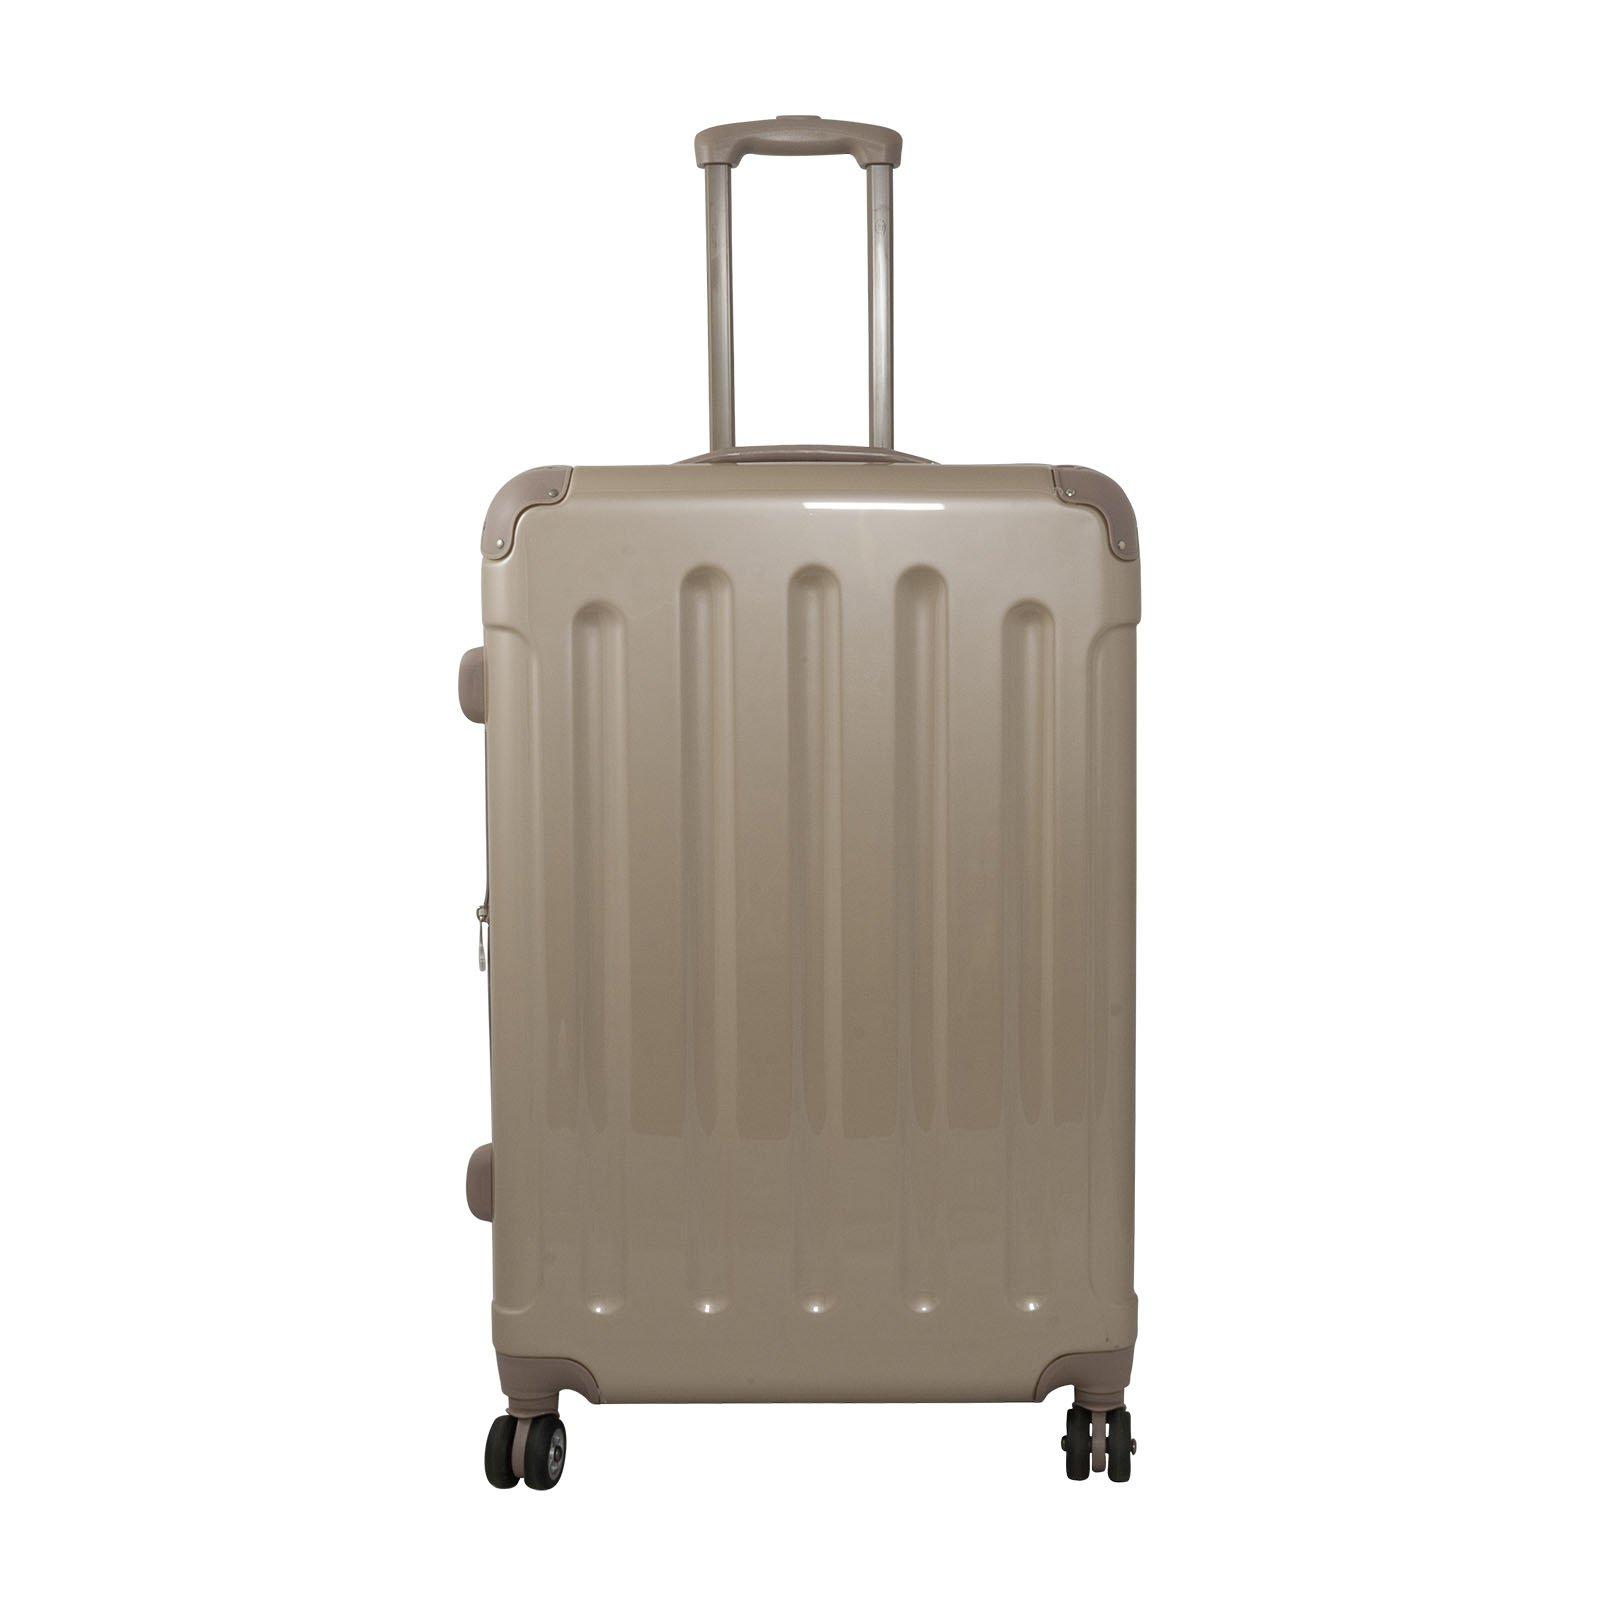 I I Trendyshop365 - Polycarbonat Reisekoffer Trolley ...